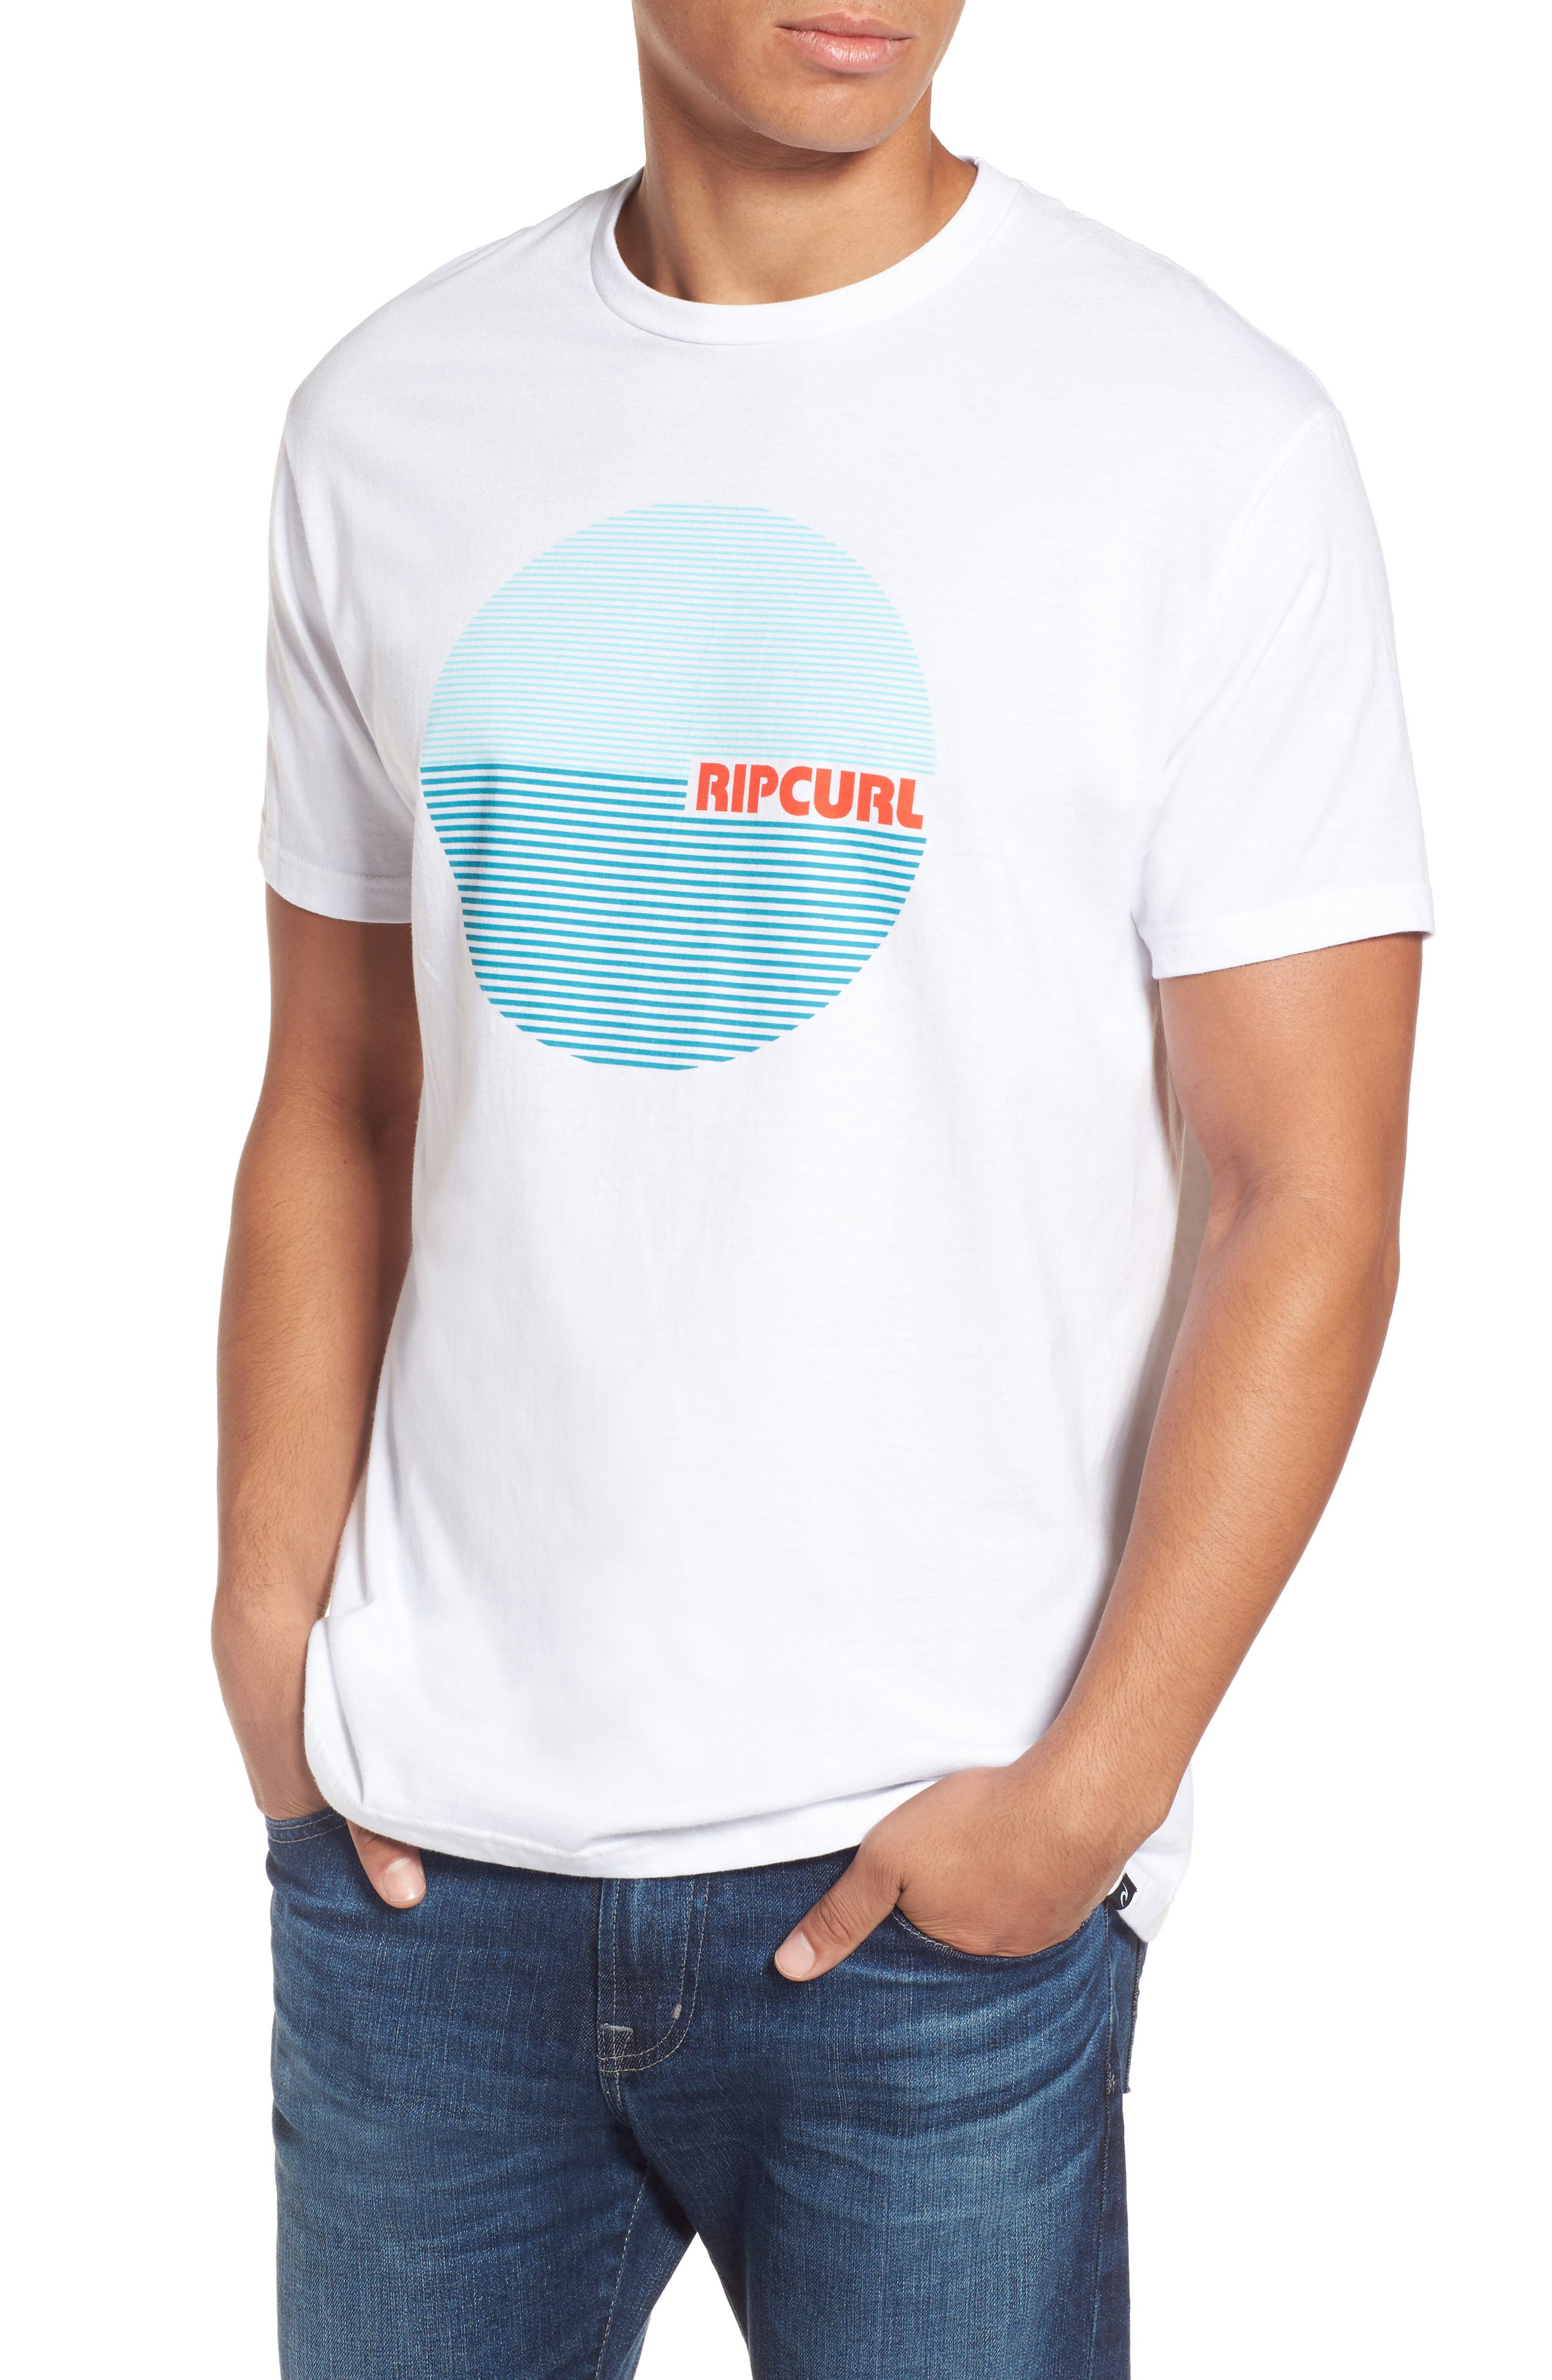 Alternate Image 1 Selected - Rip Curl Terra Graphic T-Shirt